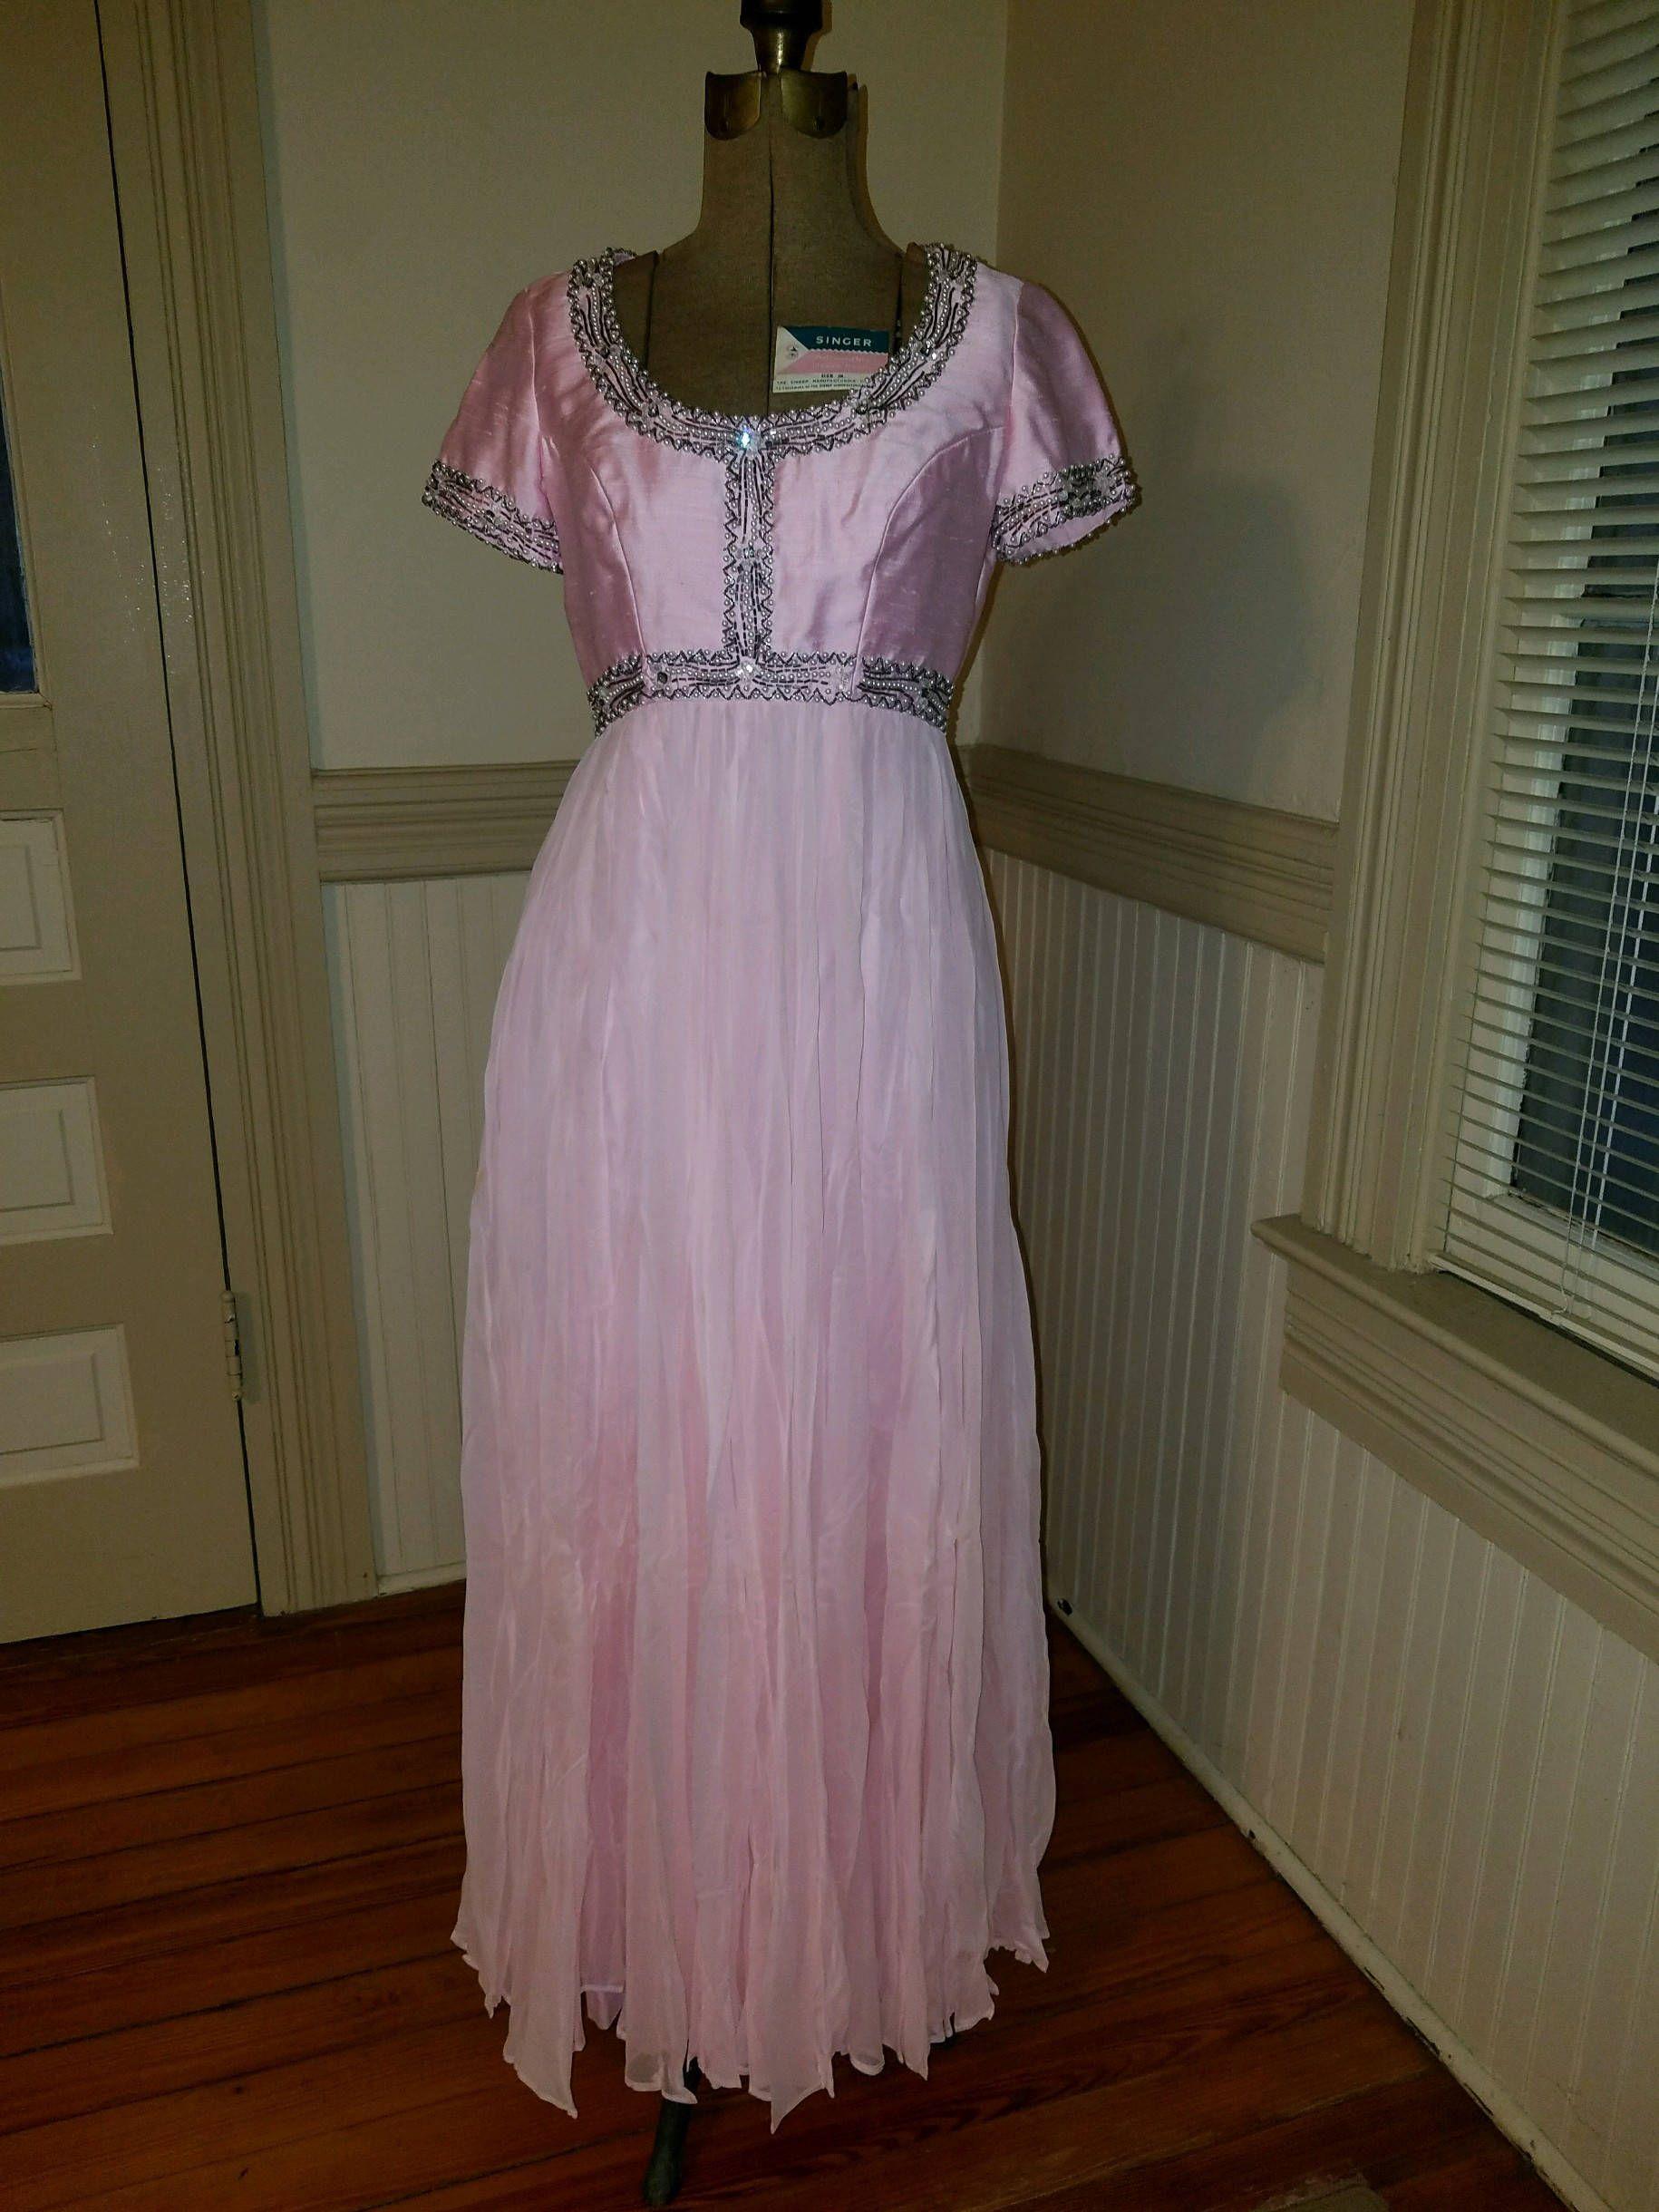 S prom dress light pink chiffon rhinestones dress pinterest